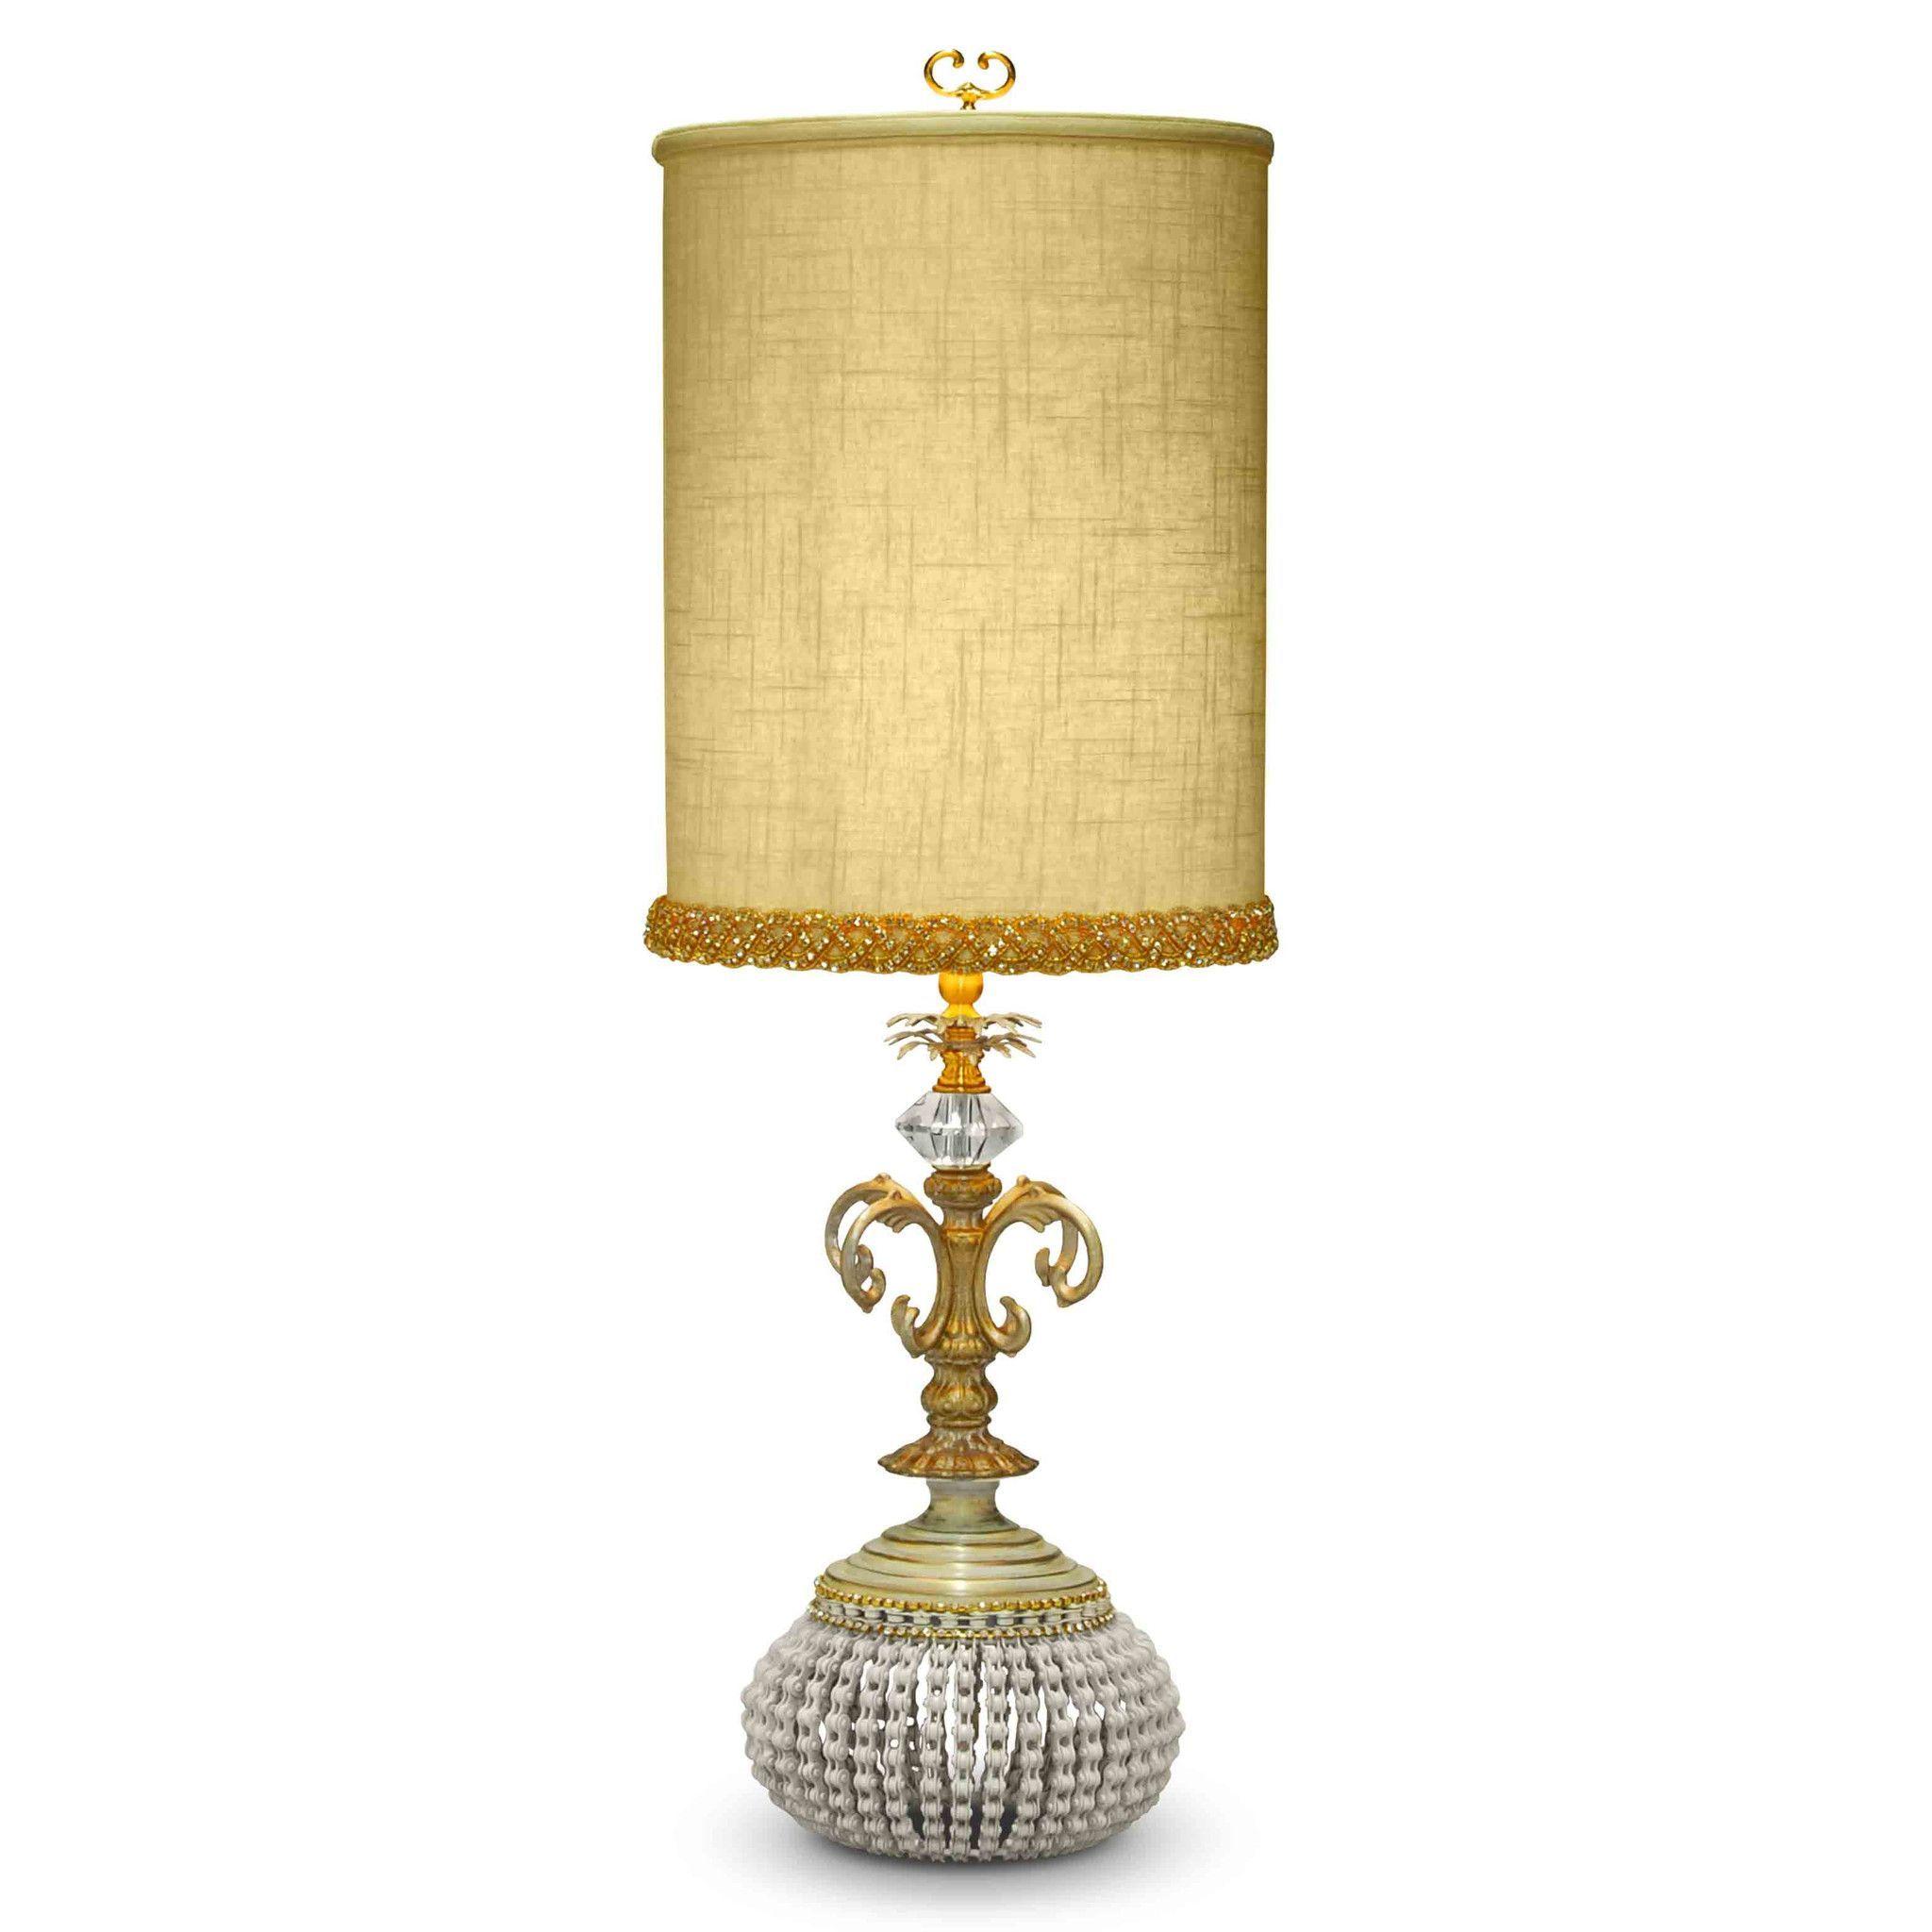 Sweetheart Gallery Mal Table Lamp Artistic Artisan Designer Lamps Sweetheart Gallery Sin Table Lamp Artistic Artisan Designer Lam Lamp Lamp Design Table Lamp